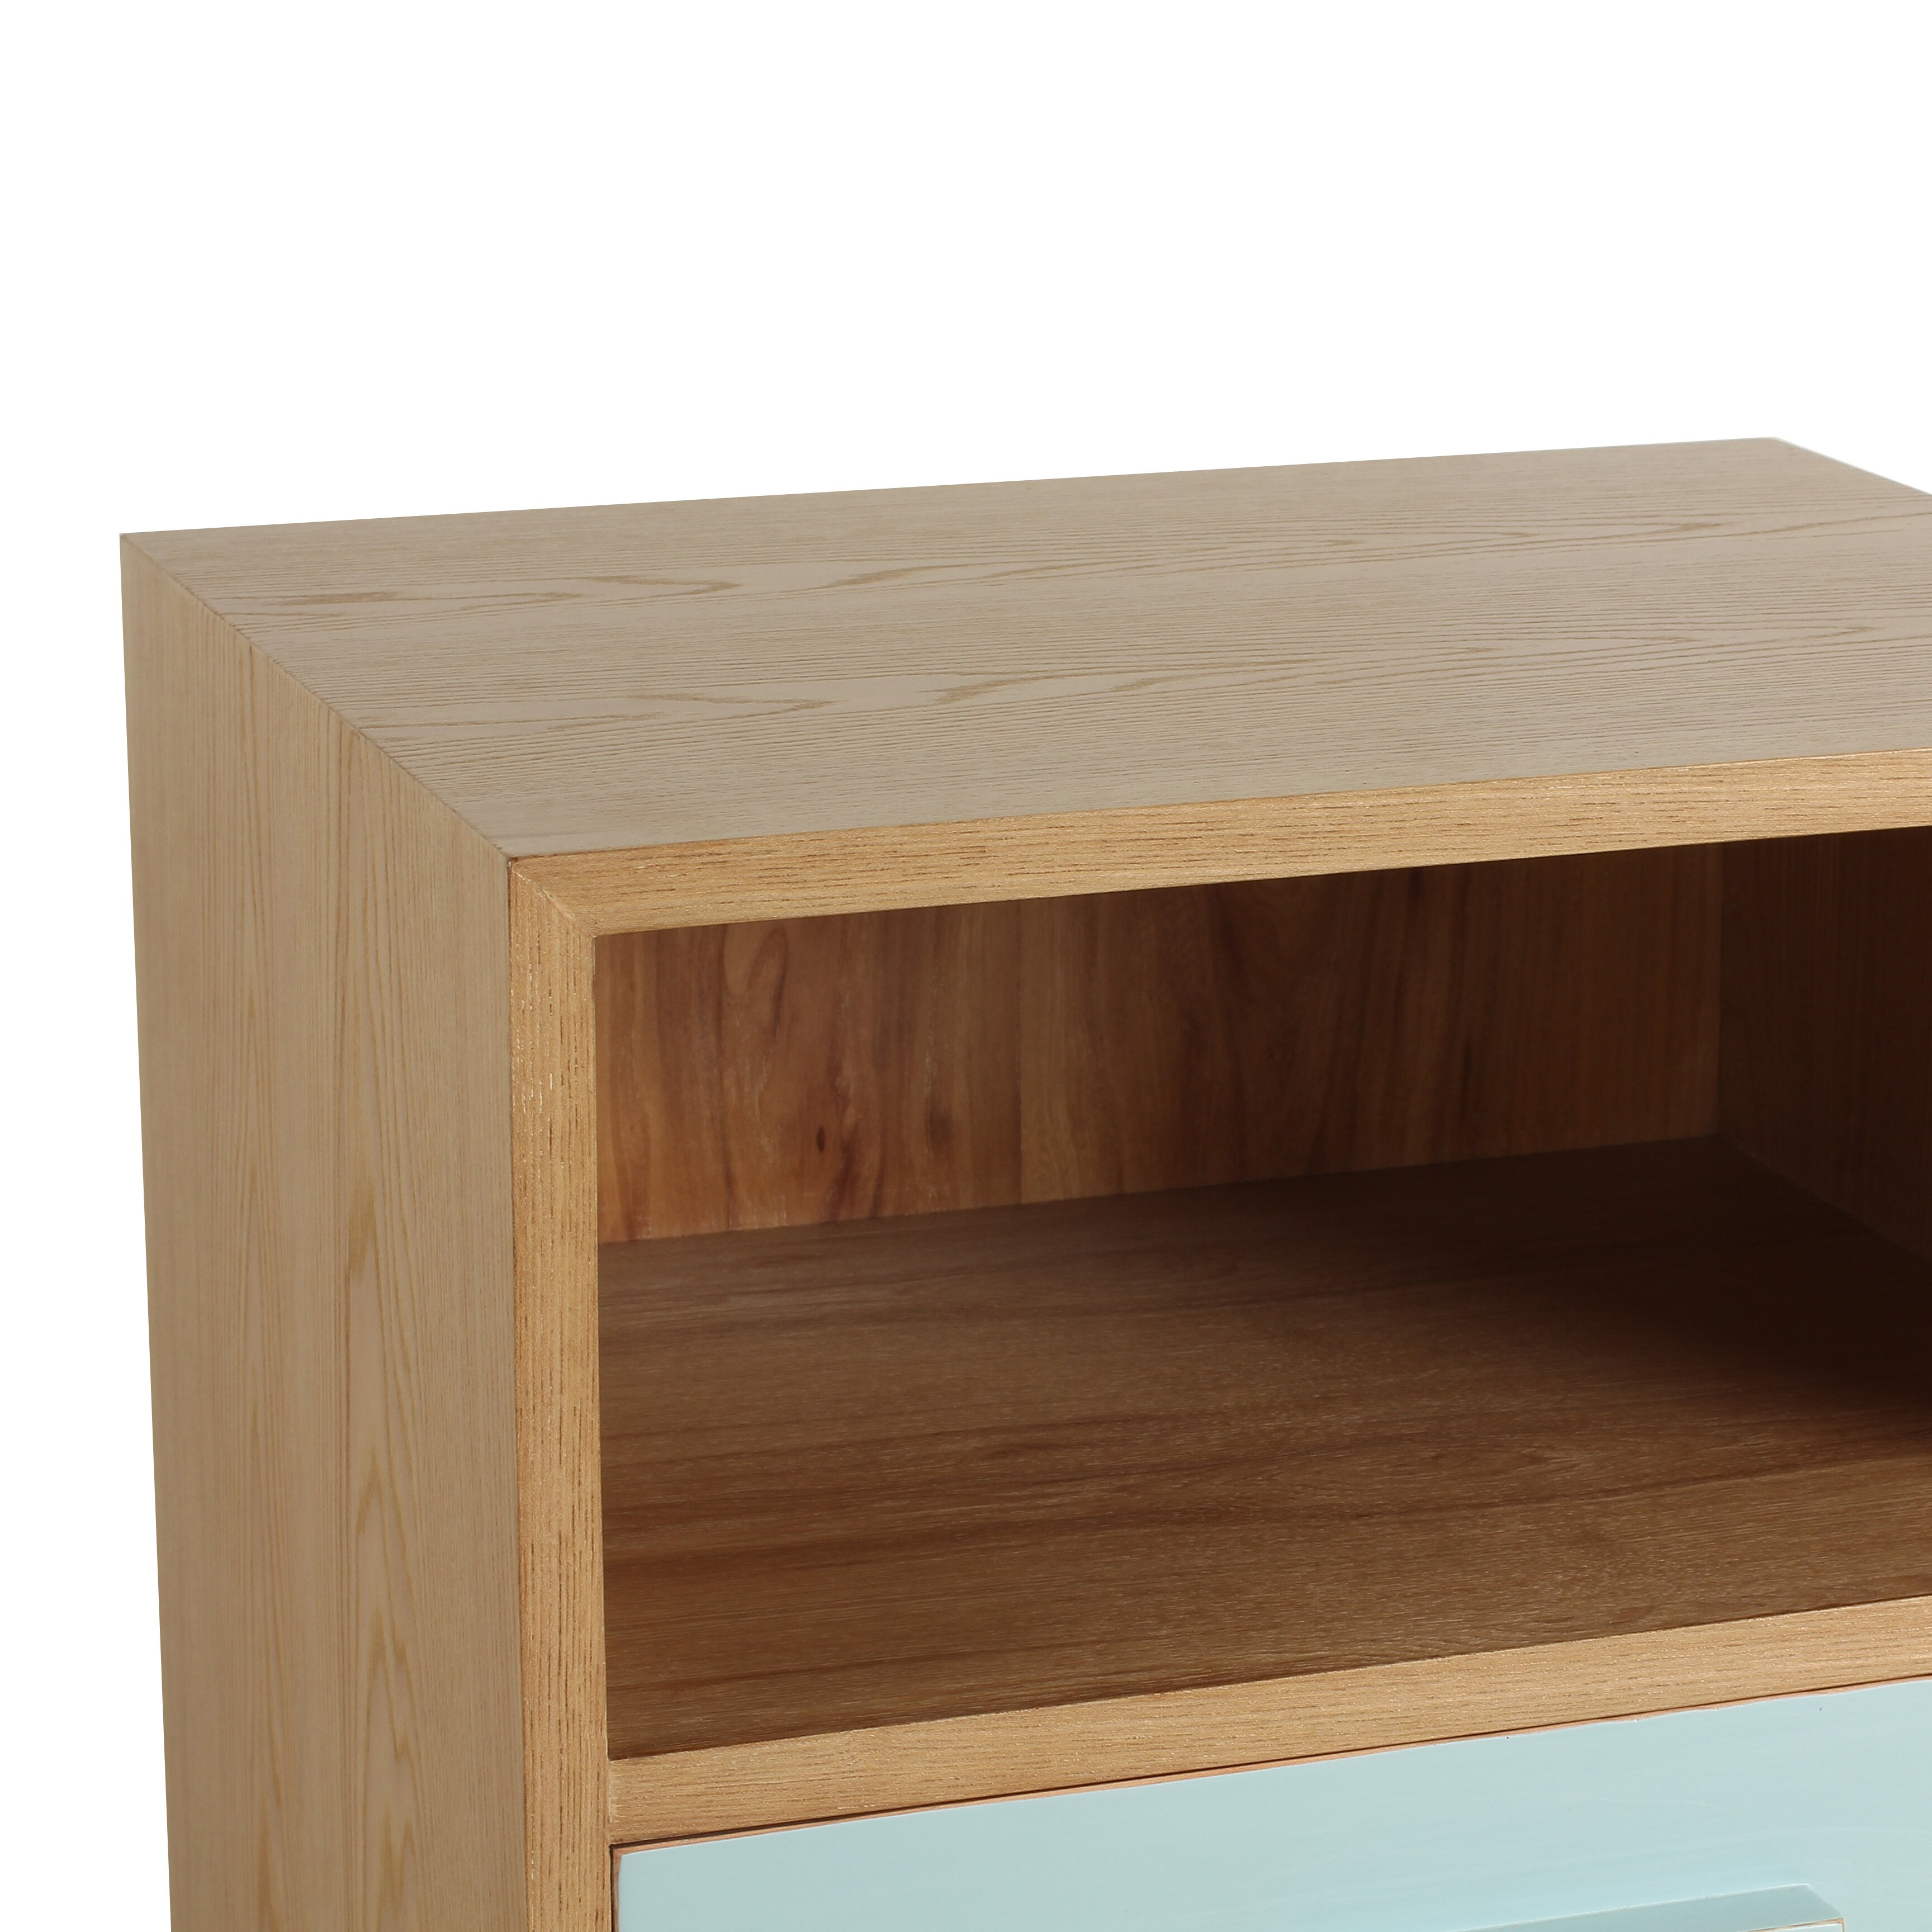 Porthos Home Zander End Table & Reviews